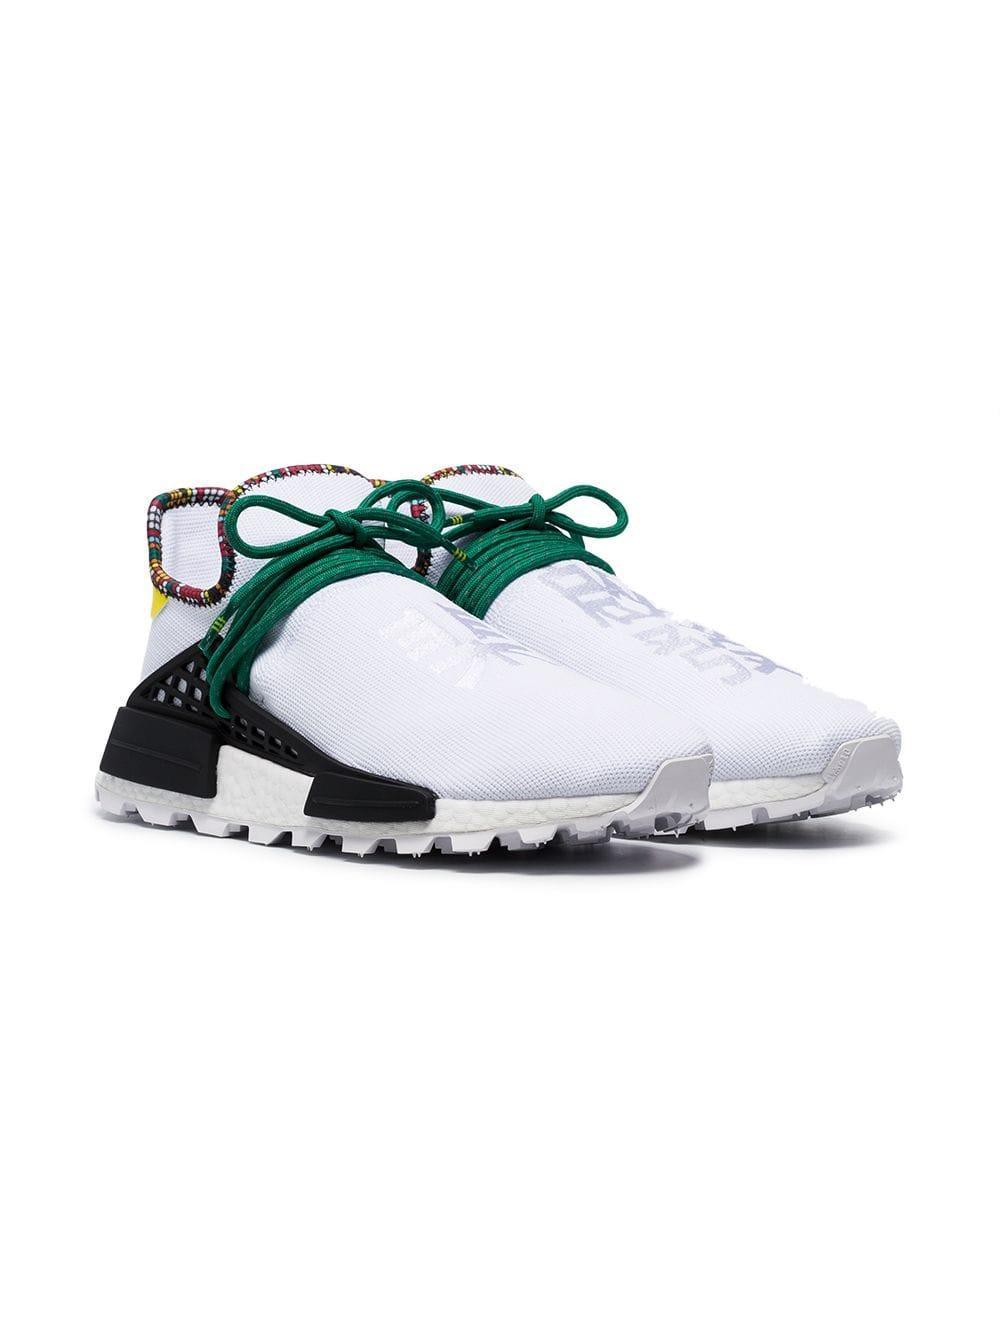 13e94cdb1 ... Pharrell Williams White Human Body Nmd Sneakers for Men - Lyst. View  fullscreen